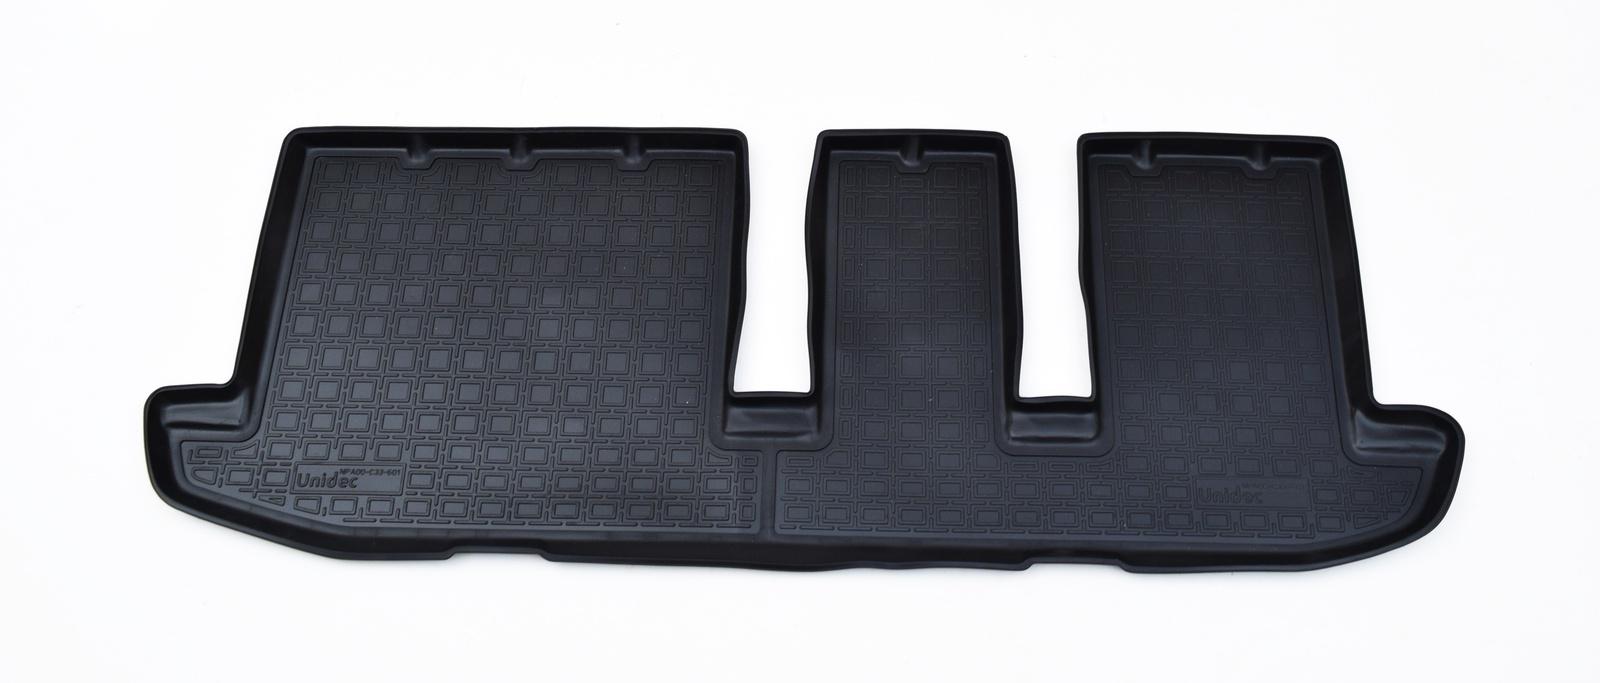 Коврики салона Norplast для Infiniti JX (L50) (2012) (3 ряд)/ Infiniti QX60 (L50) (2013) (3 ряд), NPA00-C33-601, черный 2013 2014 infiniti jx35 jx qx60 alloy engine skid plate engine protection plate